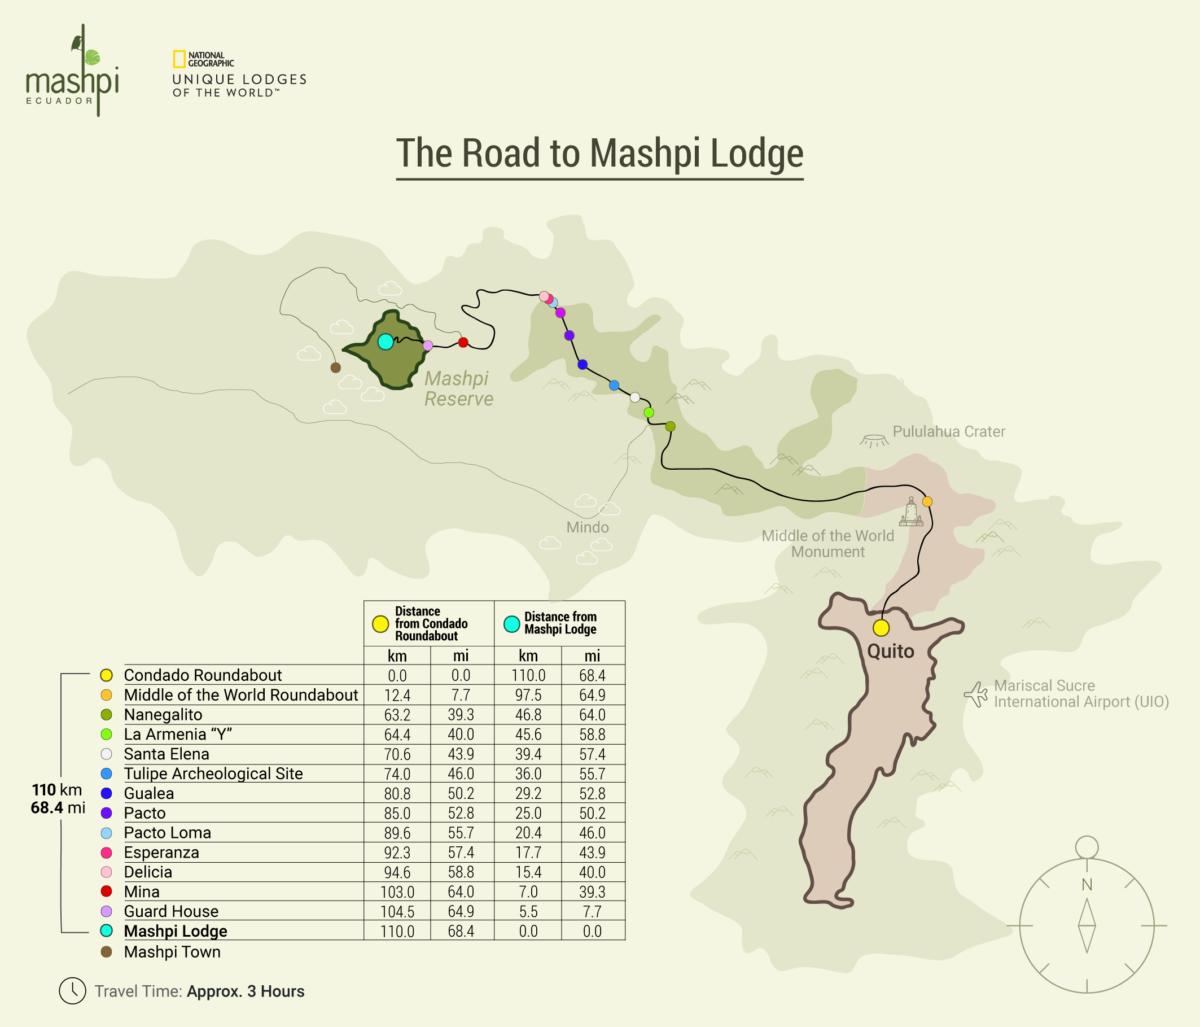 Road to Mashpi Lodge Map